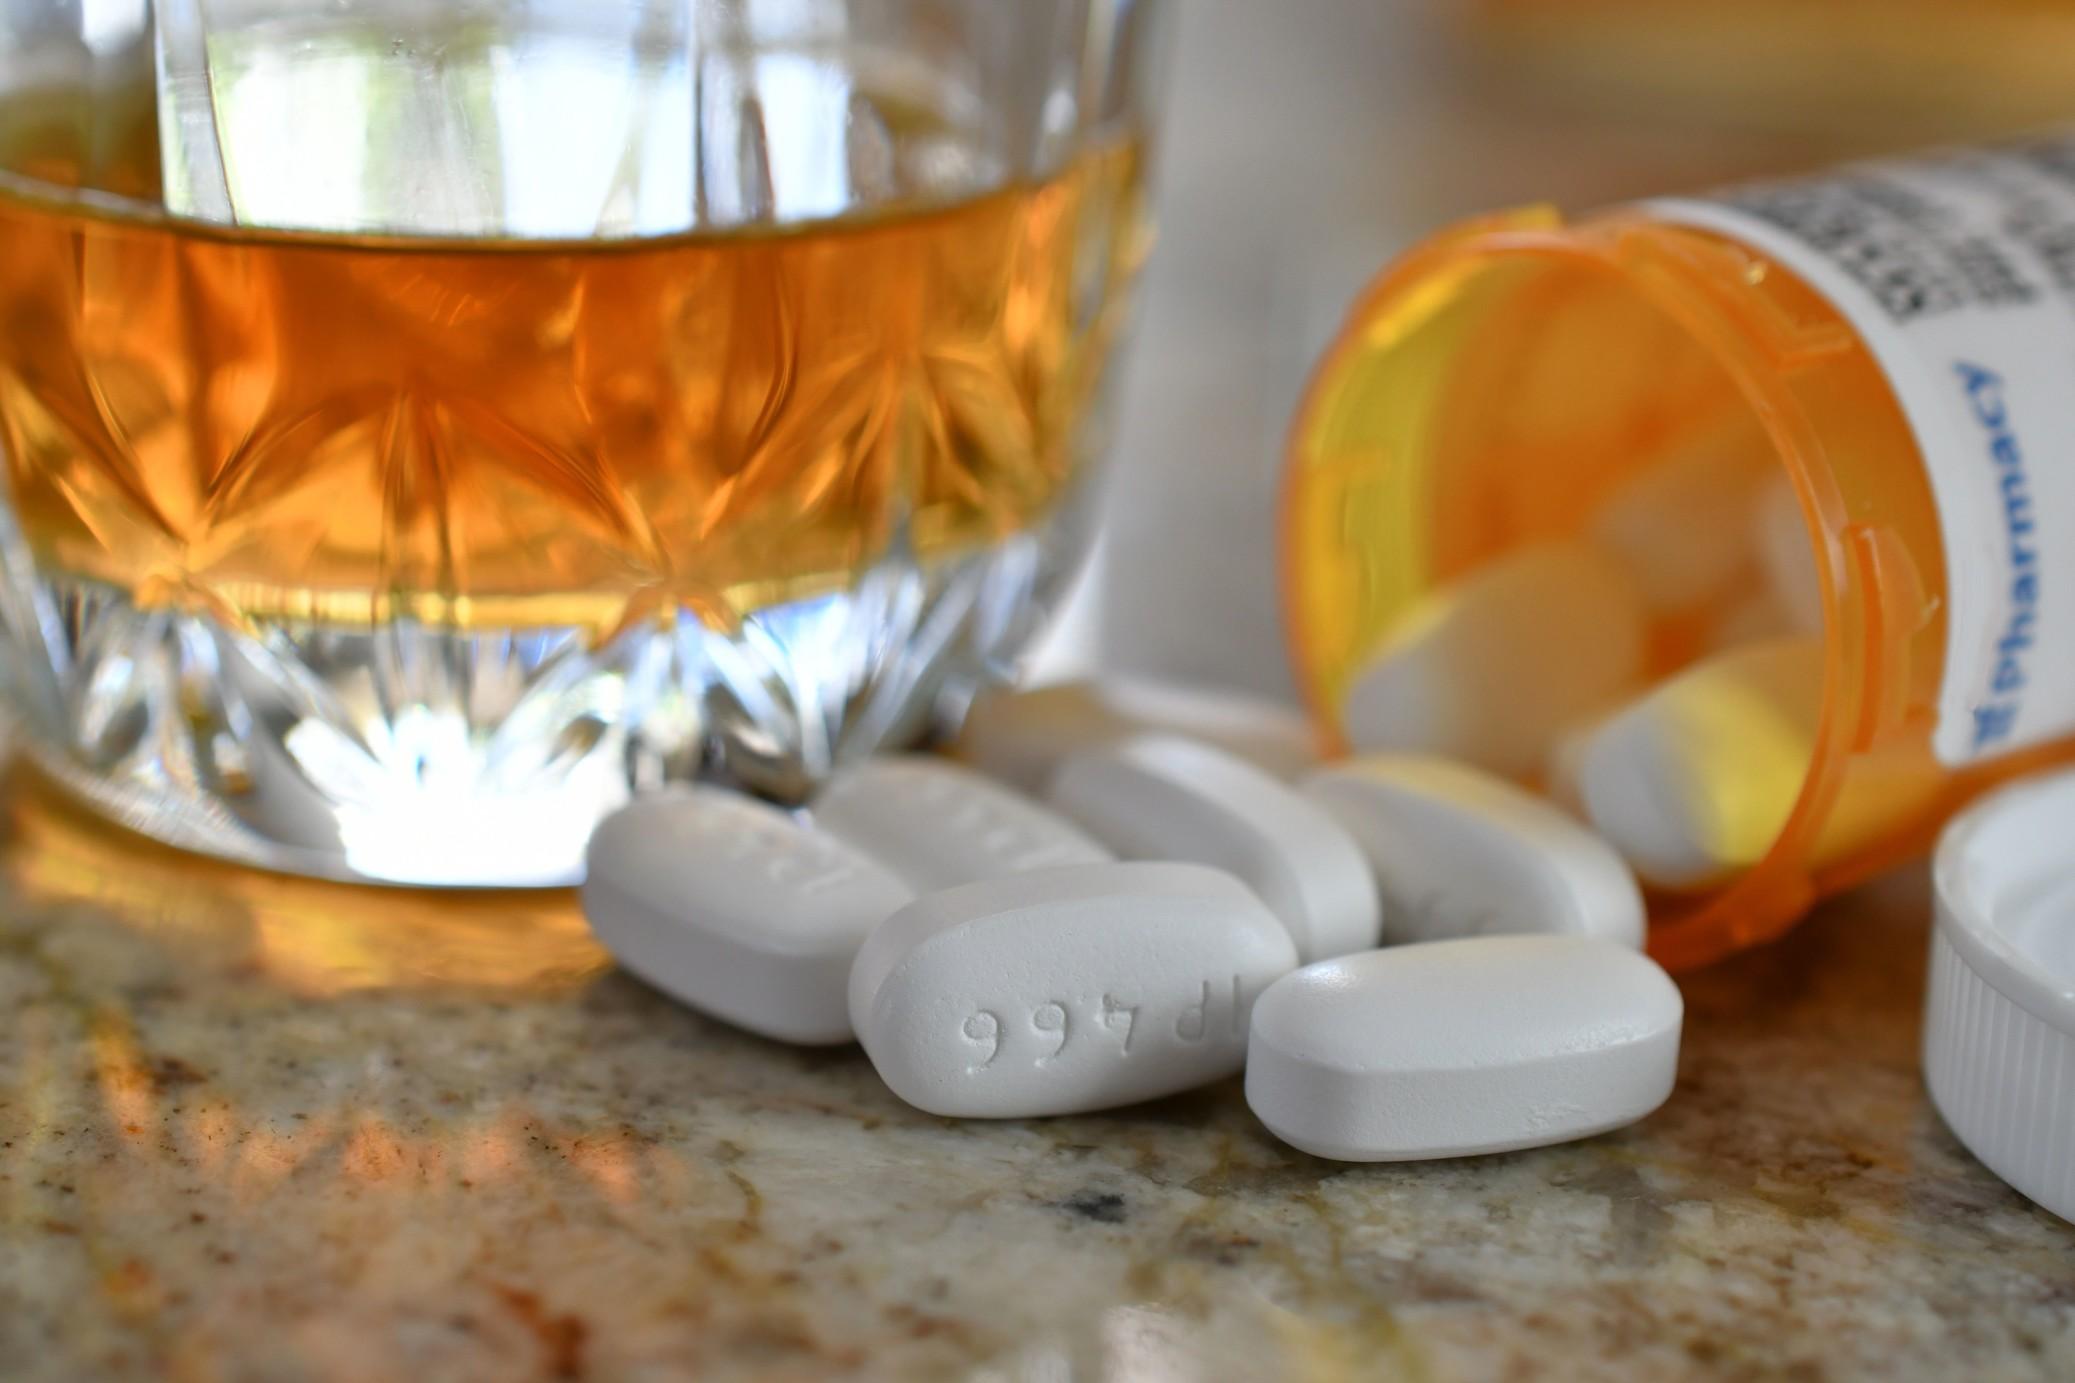 Carmeuse Alcohol & Drug Policy